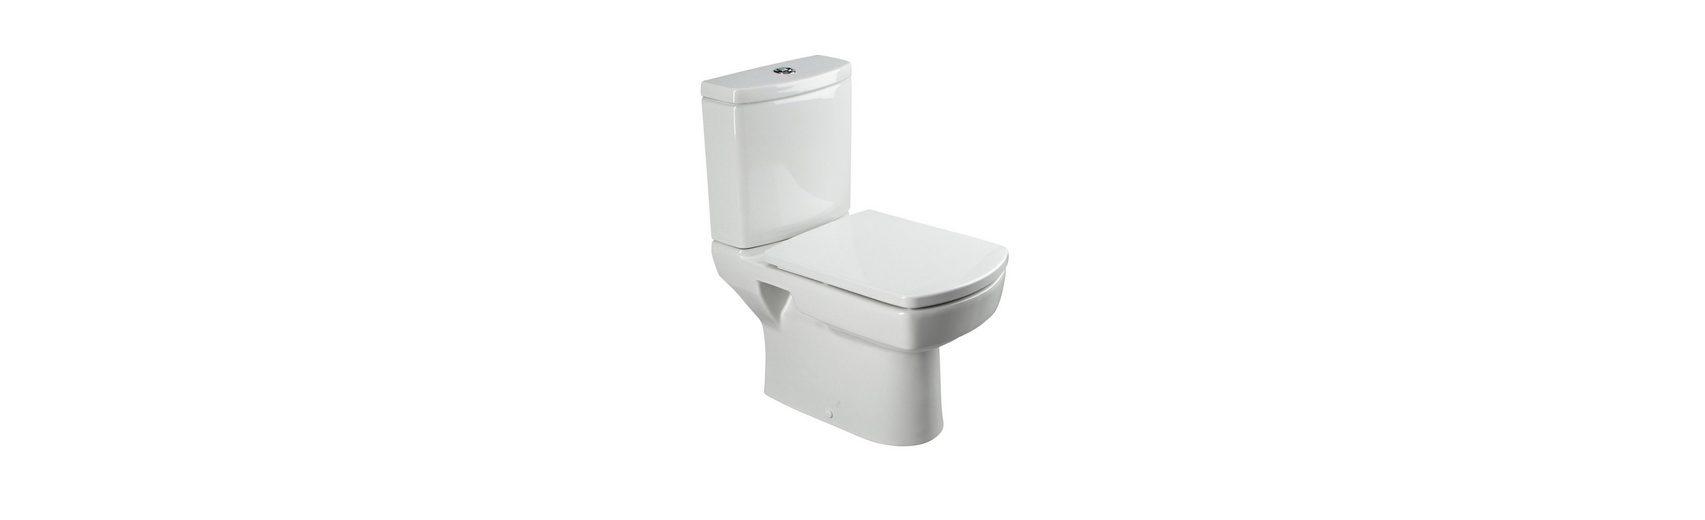 WC-Sitz »Ondo«